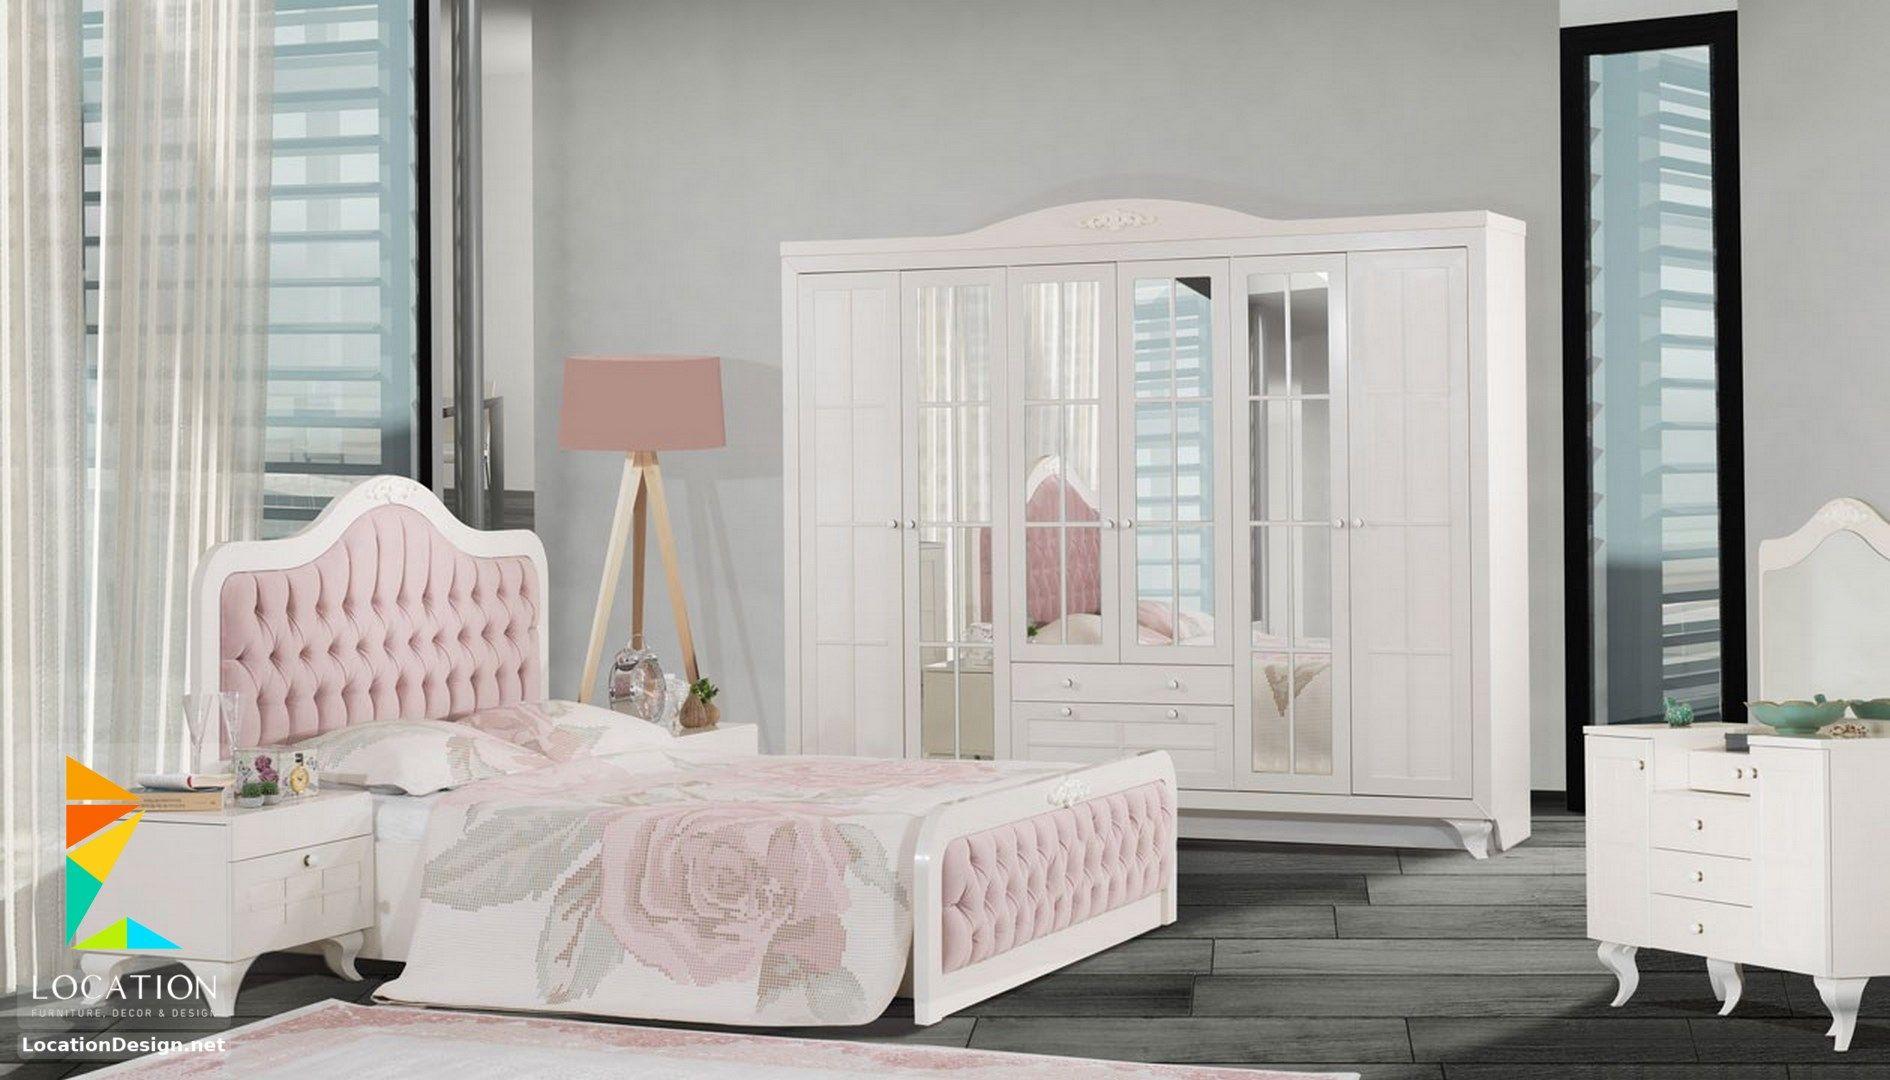 احدث موديلات و اشكال غرف نوم تركي 2019 2020 Home Decor Toddler Bed Bed